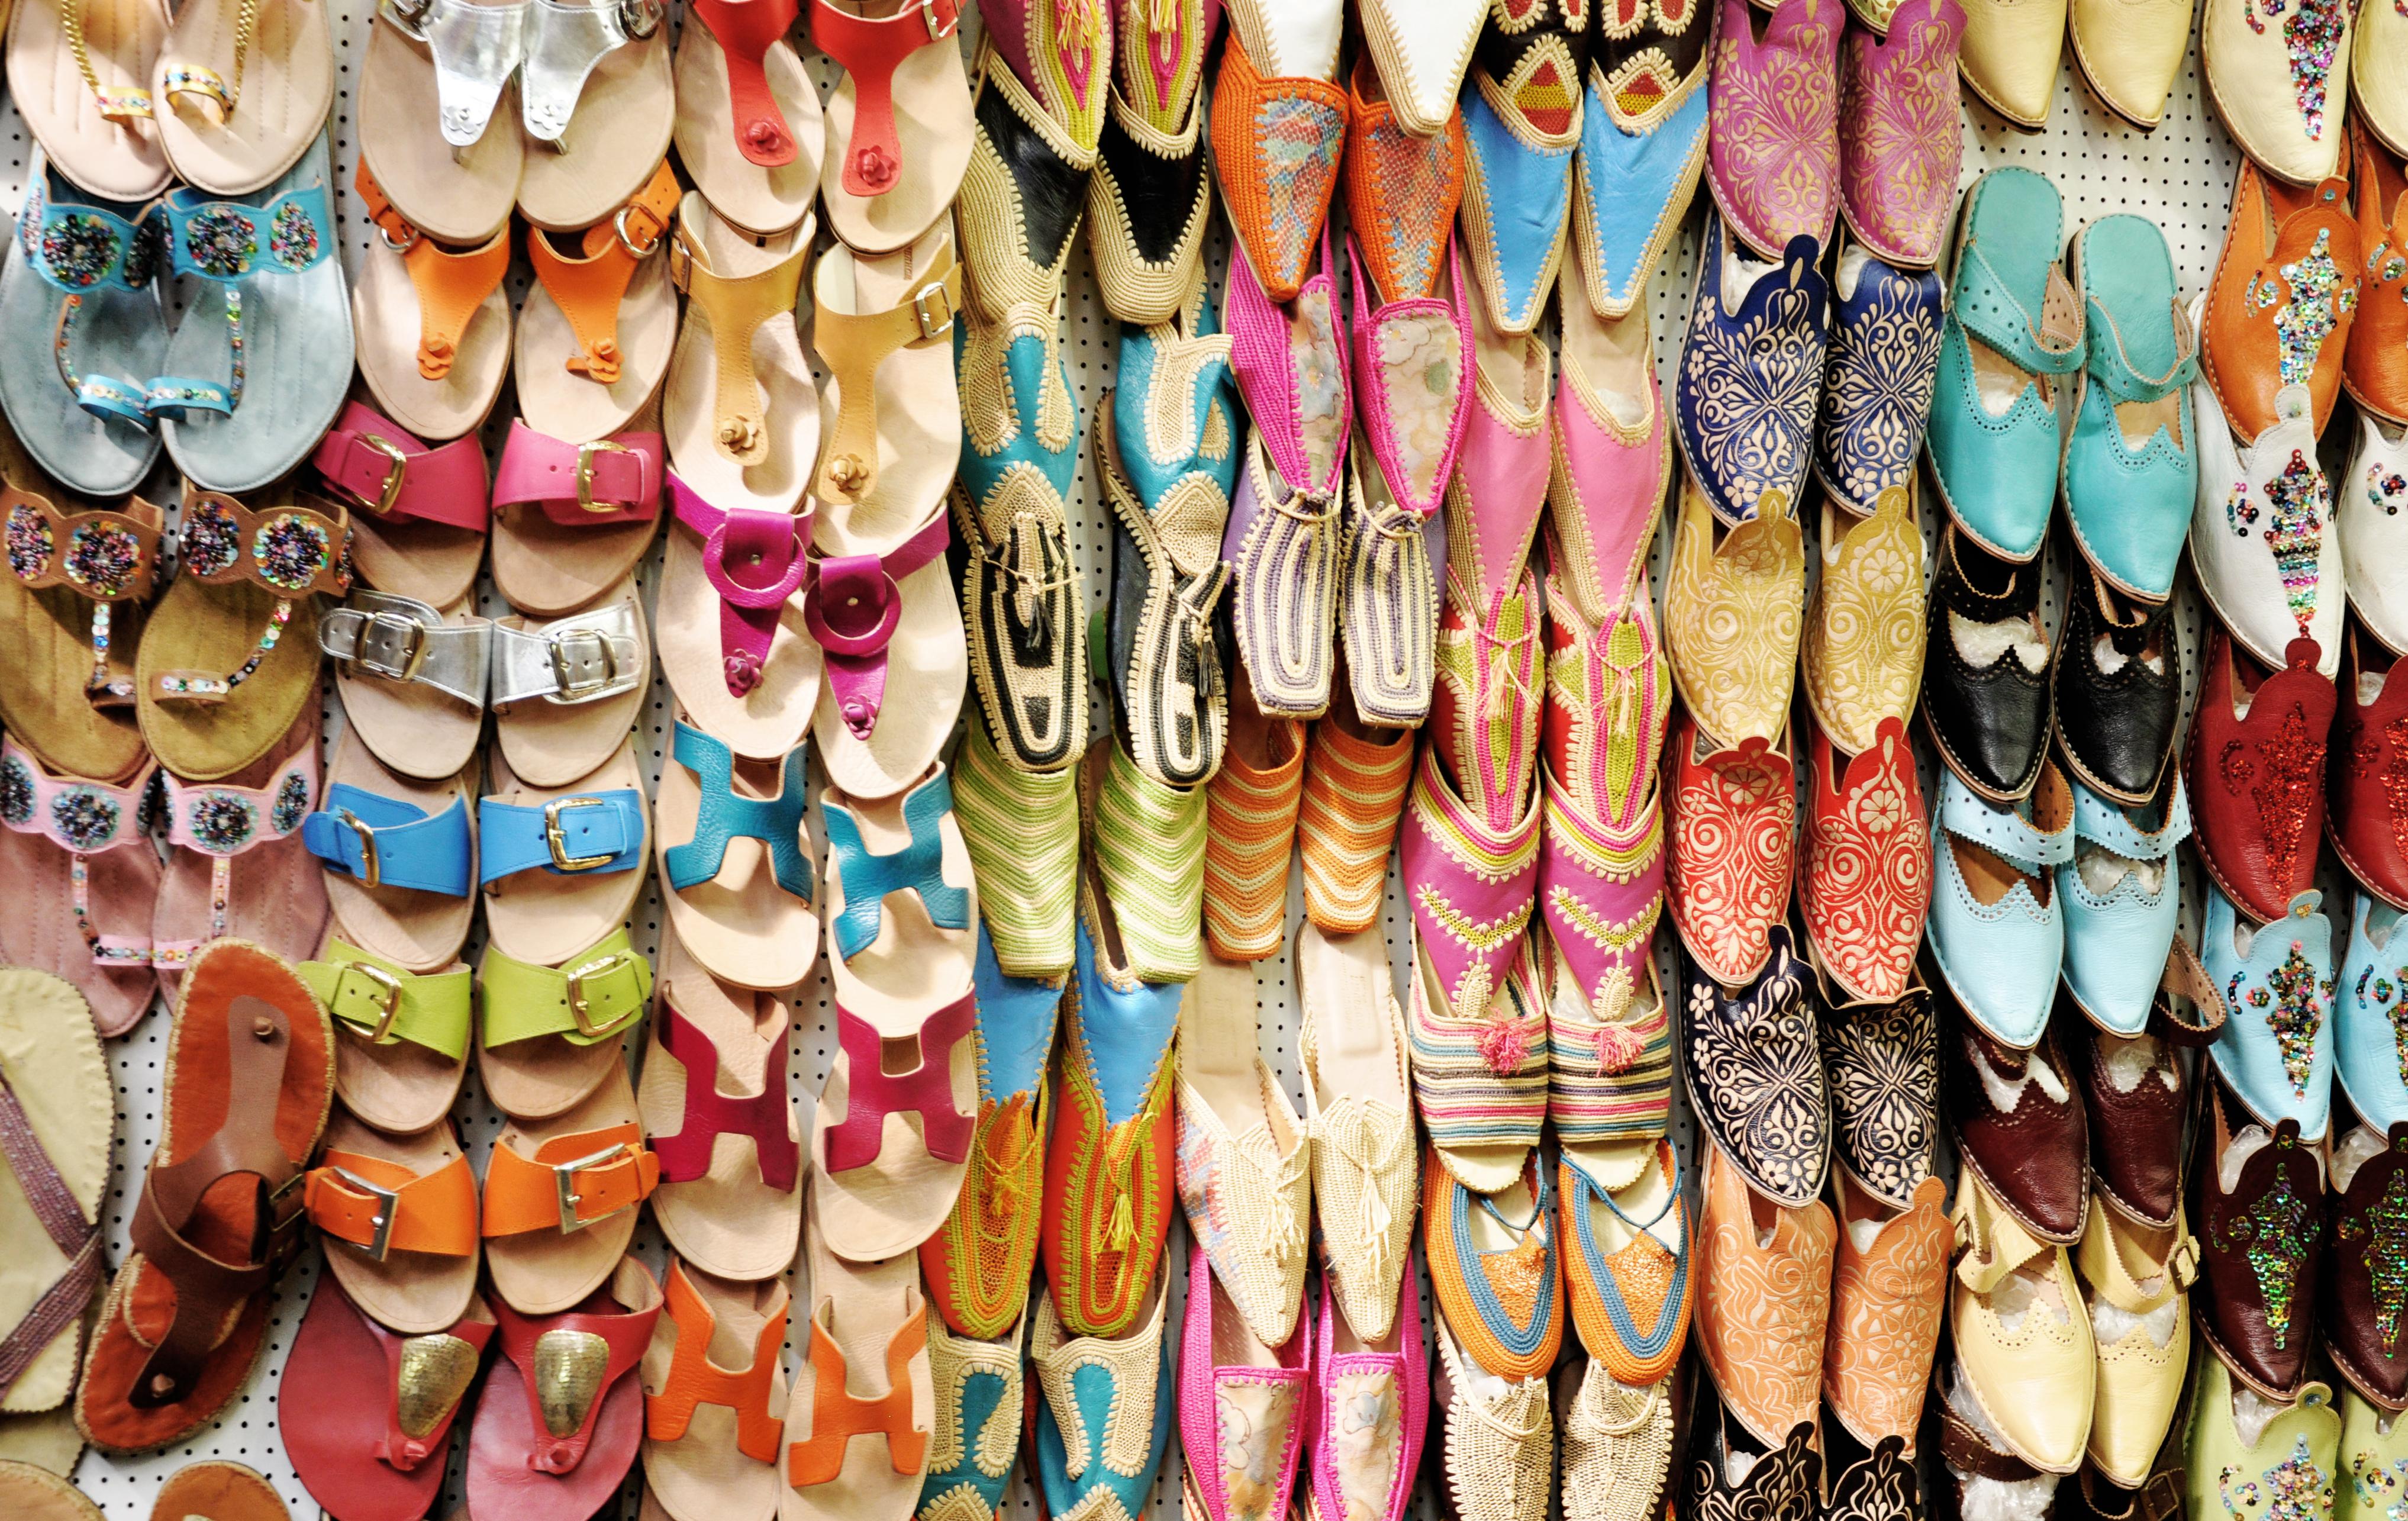 Morocco shoe display photo